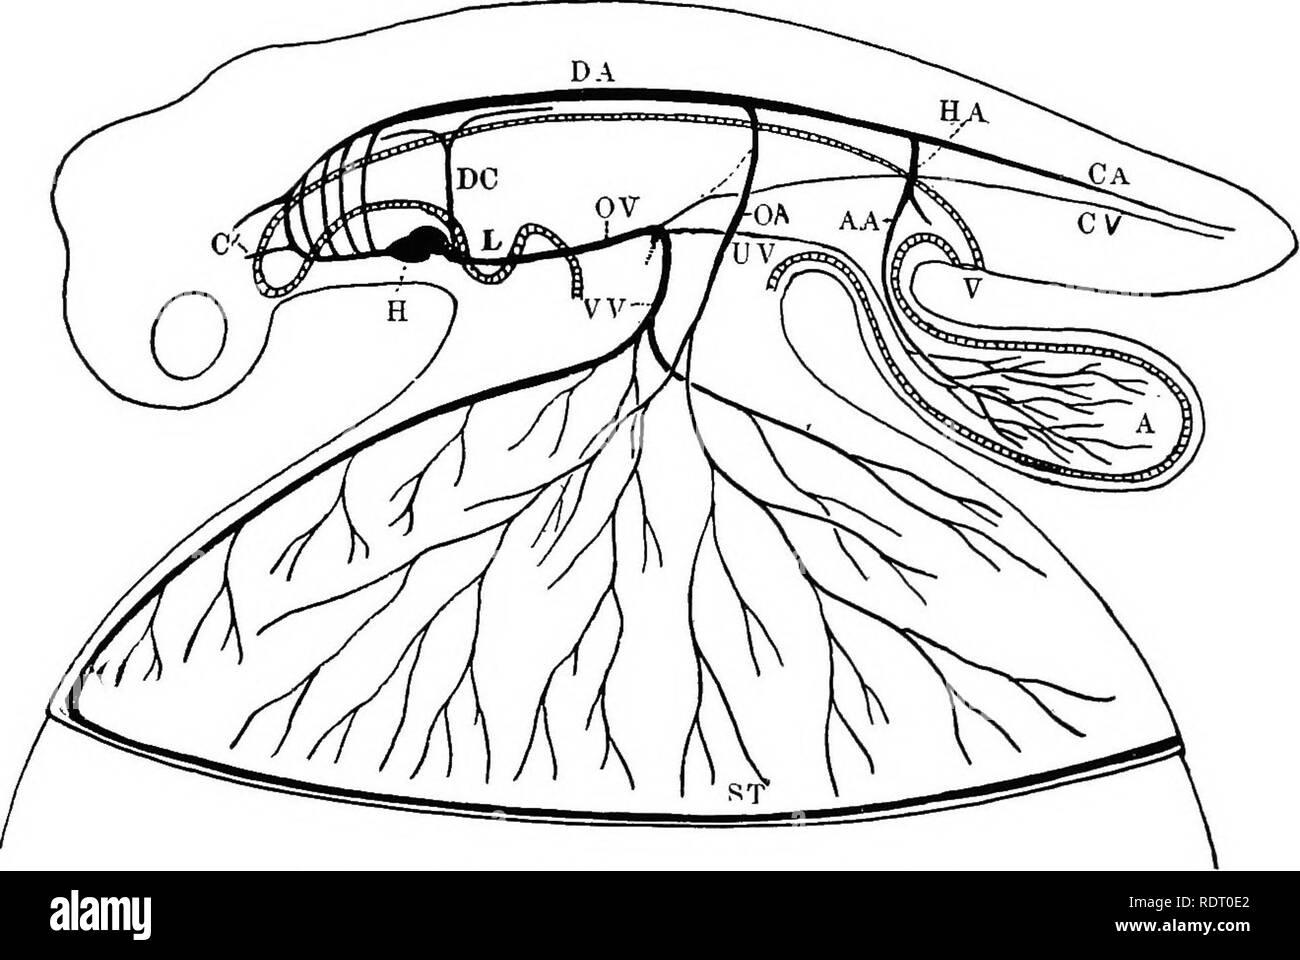 Iliac Arteries Stock Photos Iliac Arteries Stock Images Alamy